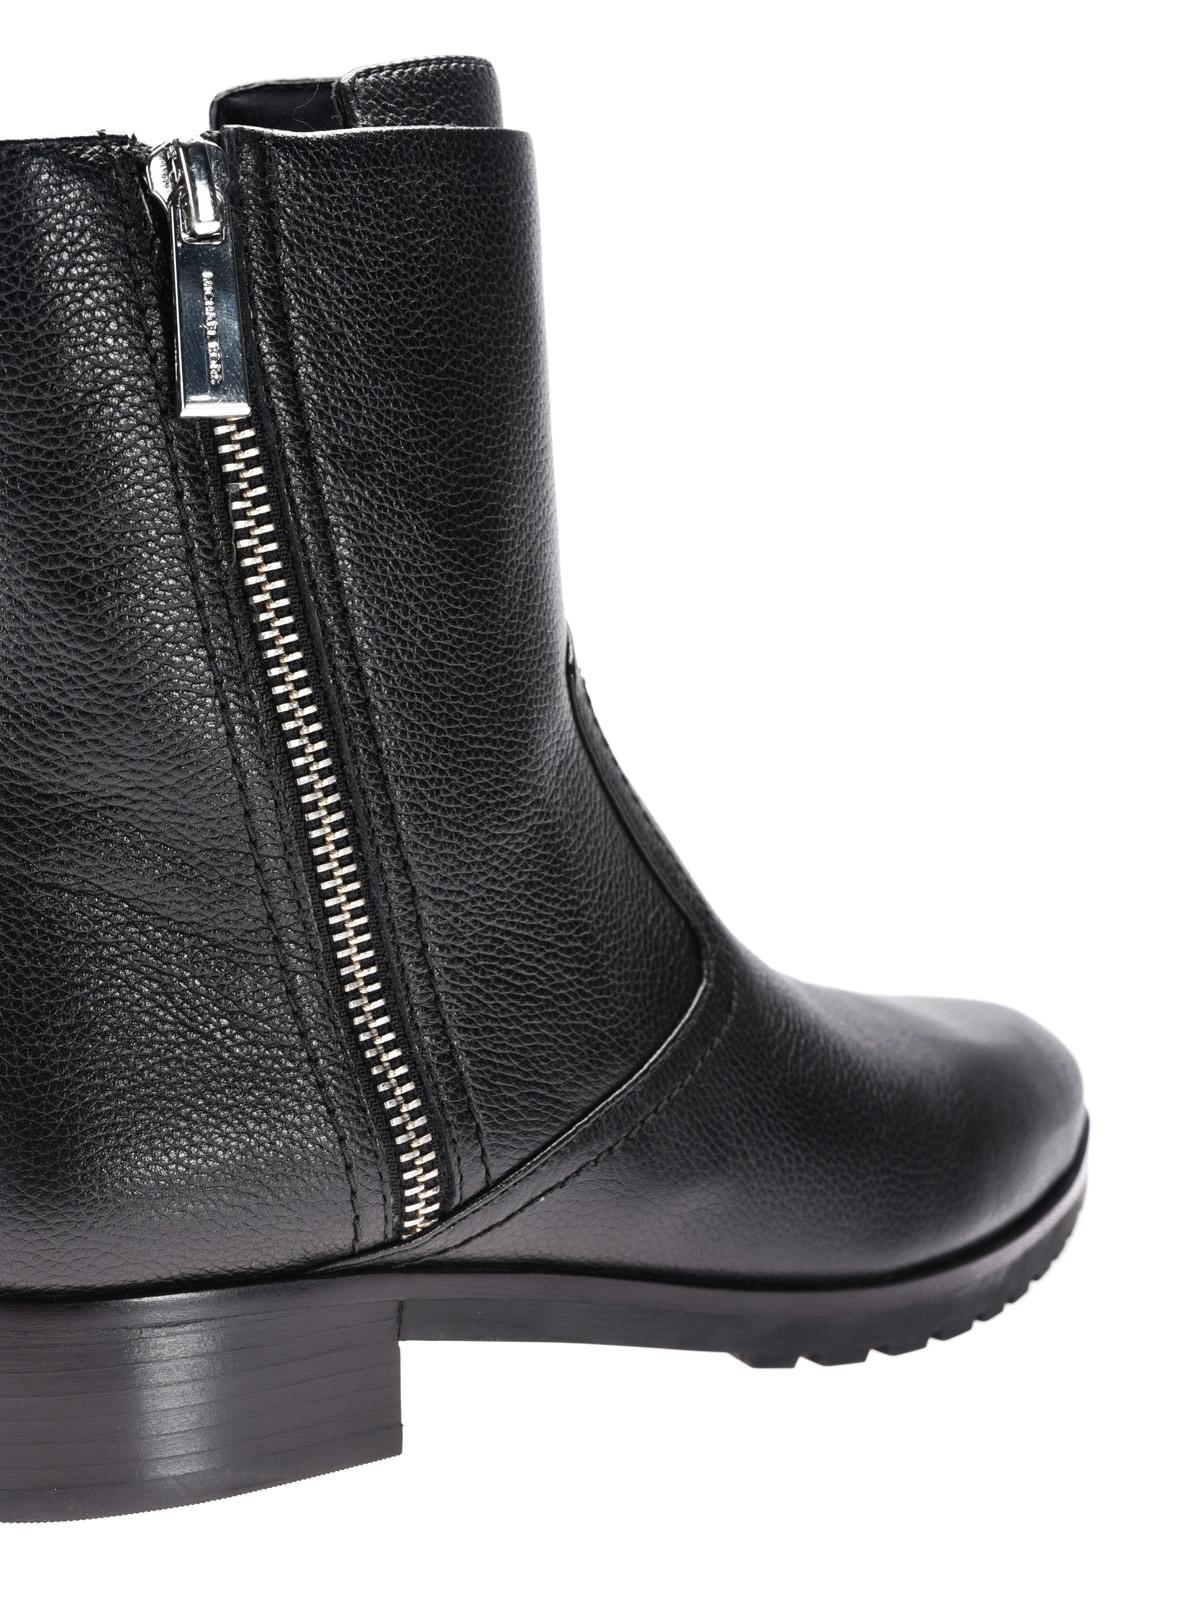 Michael Kors - Andi Flat black leather